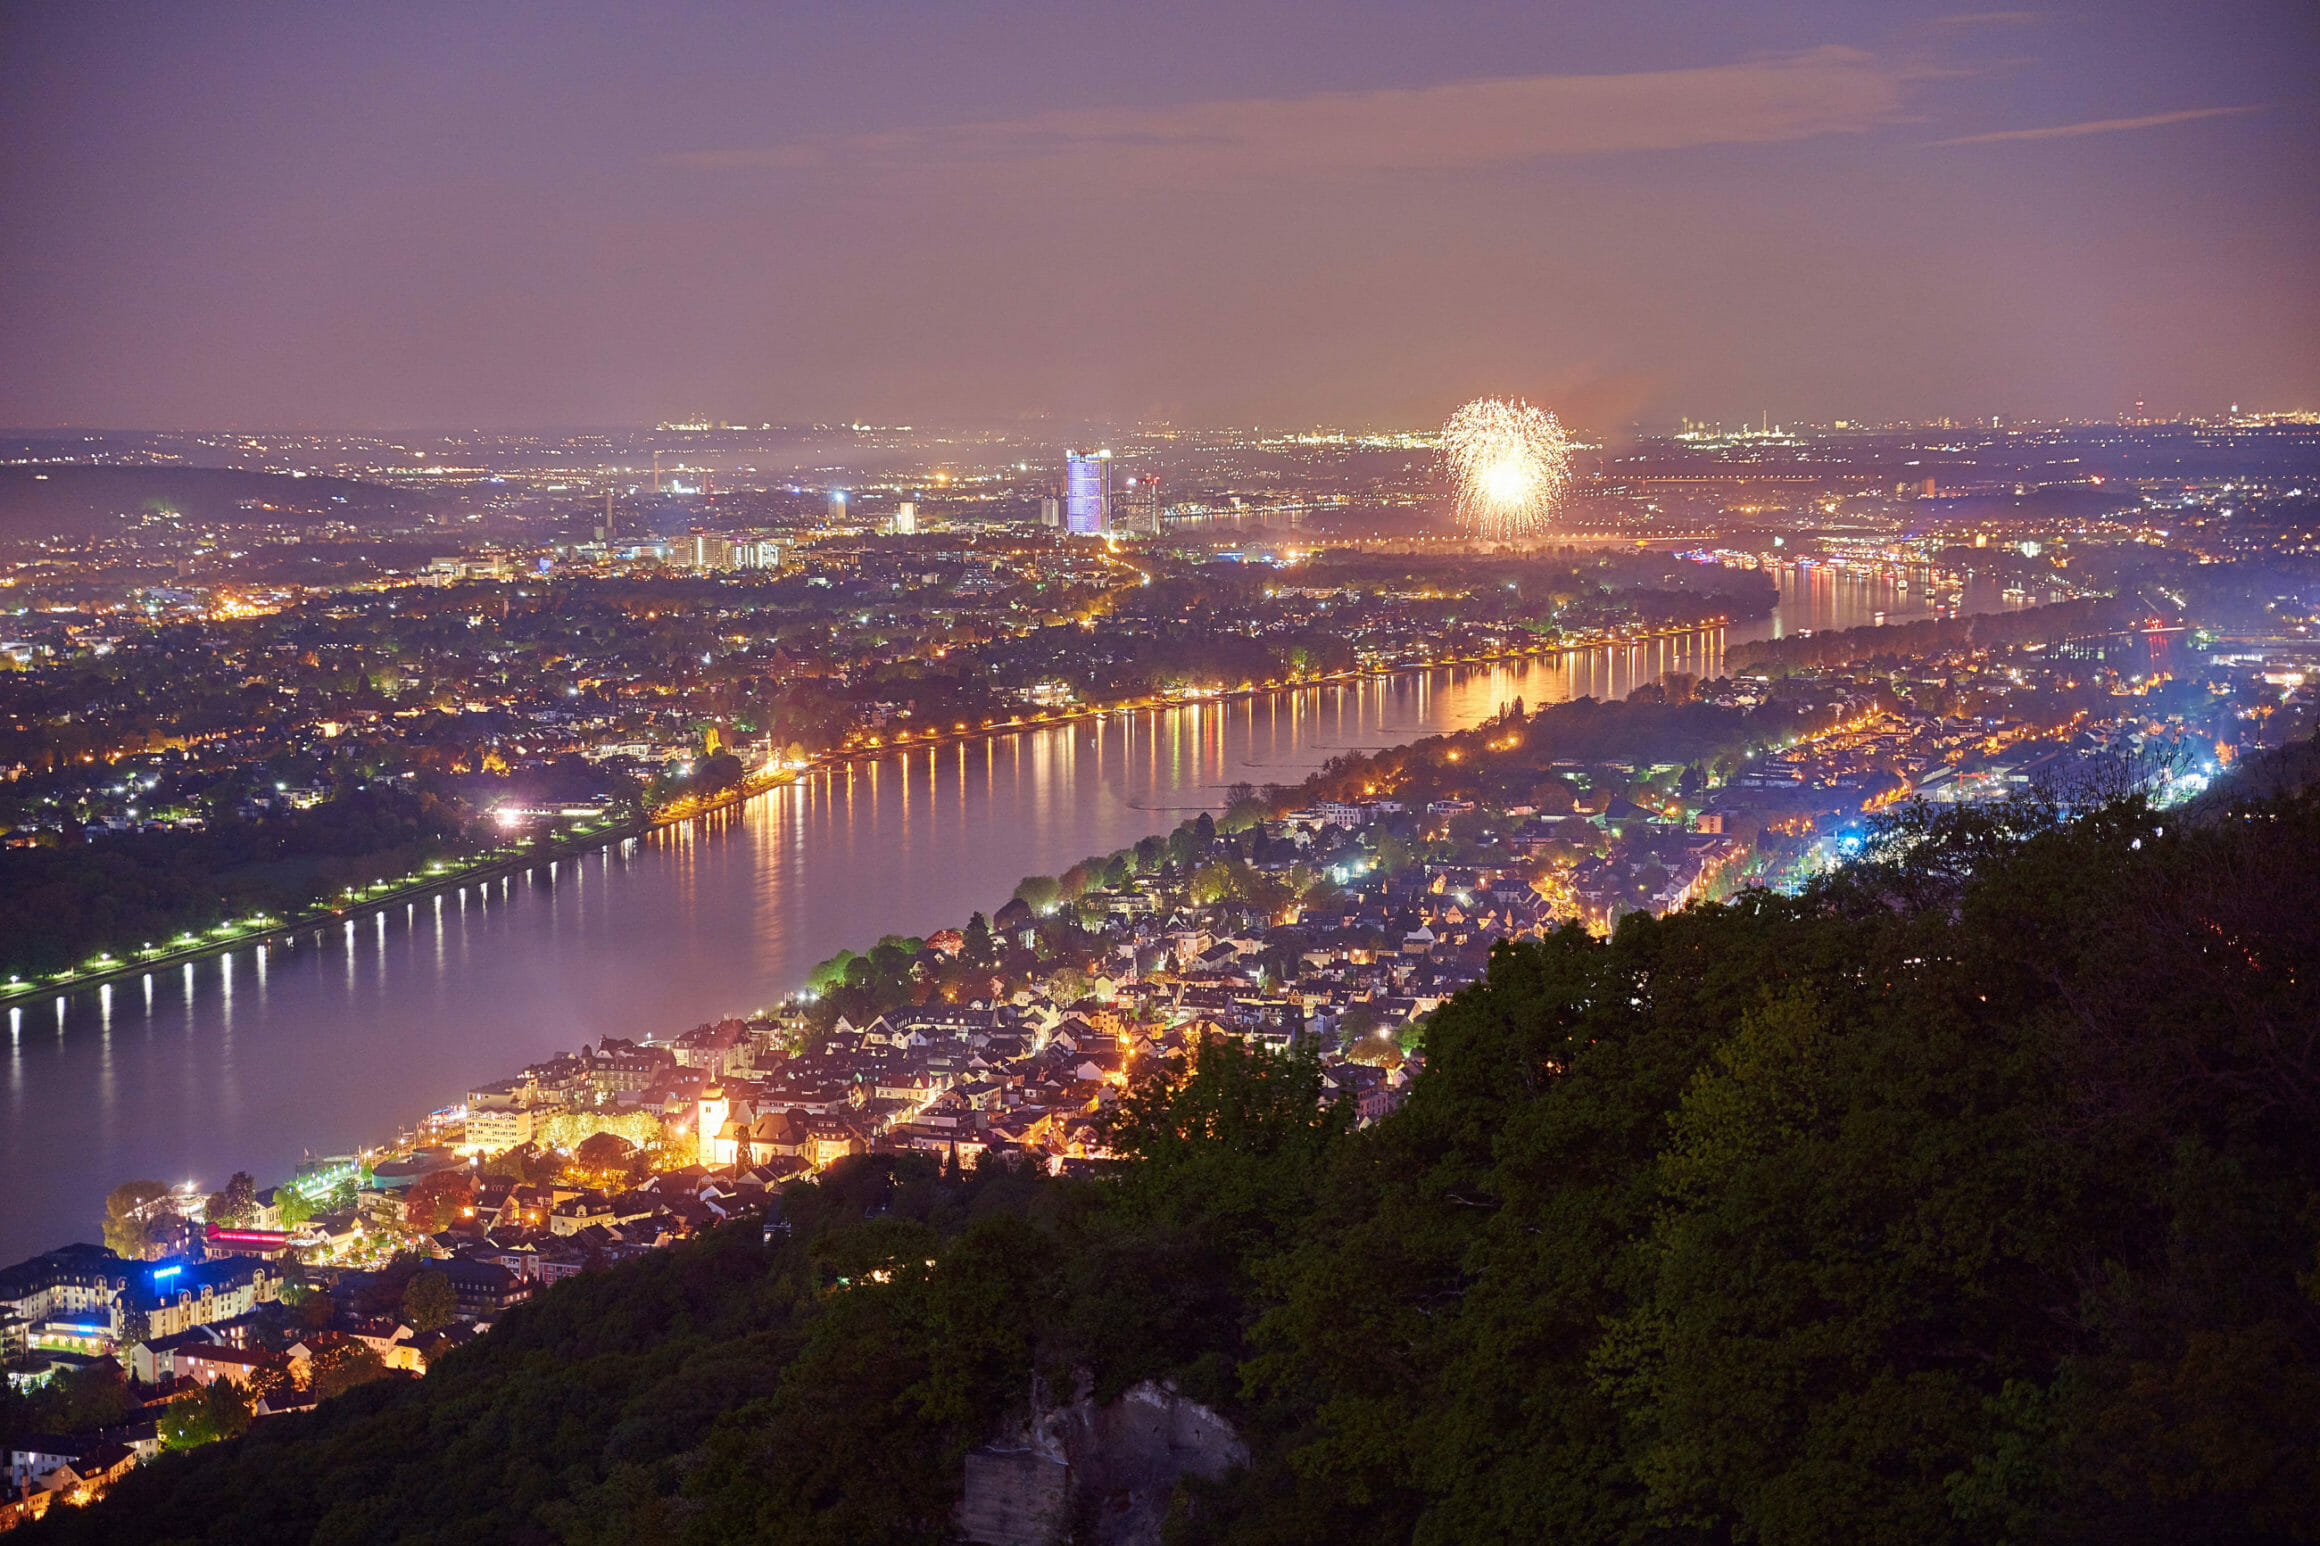 Berufsberatung in Bonn - Bonn Nachtbild